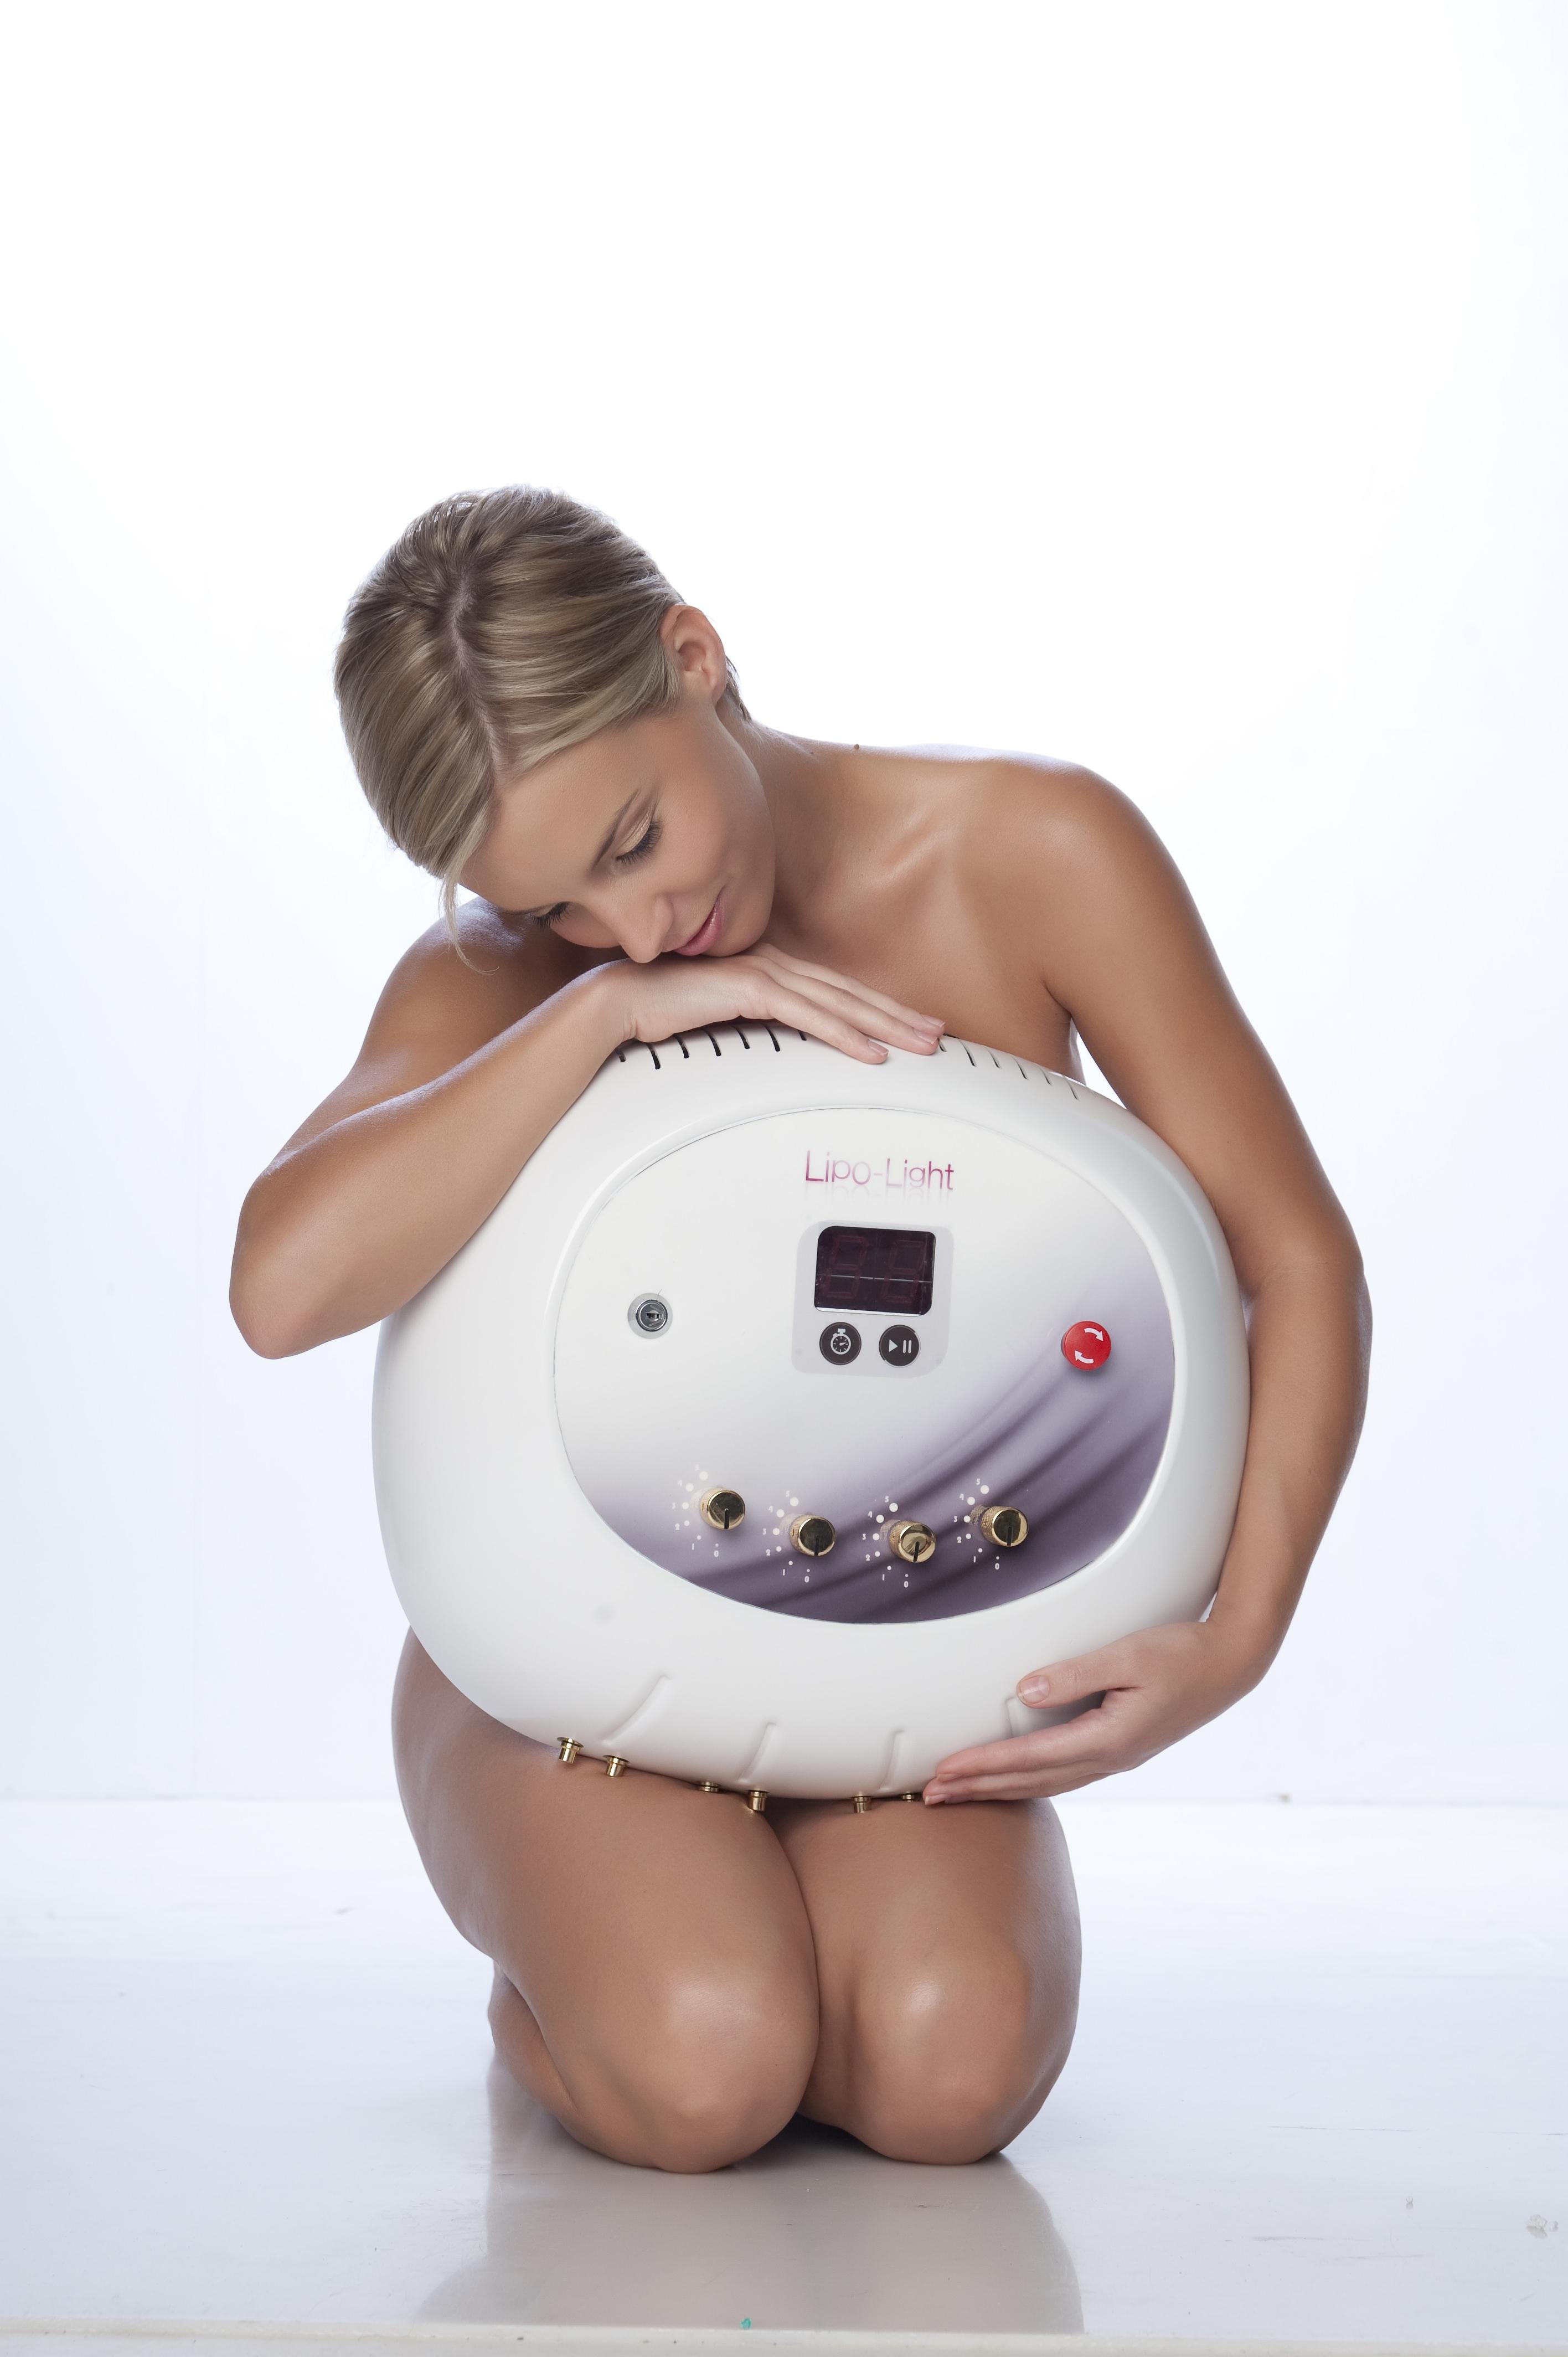 lipo-light-machine-female